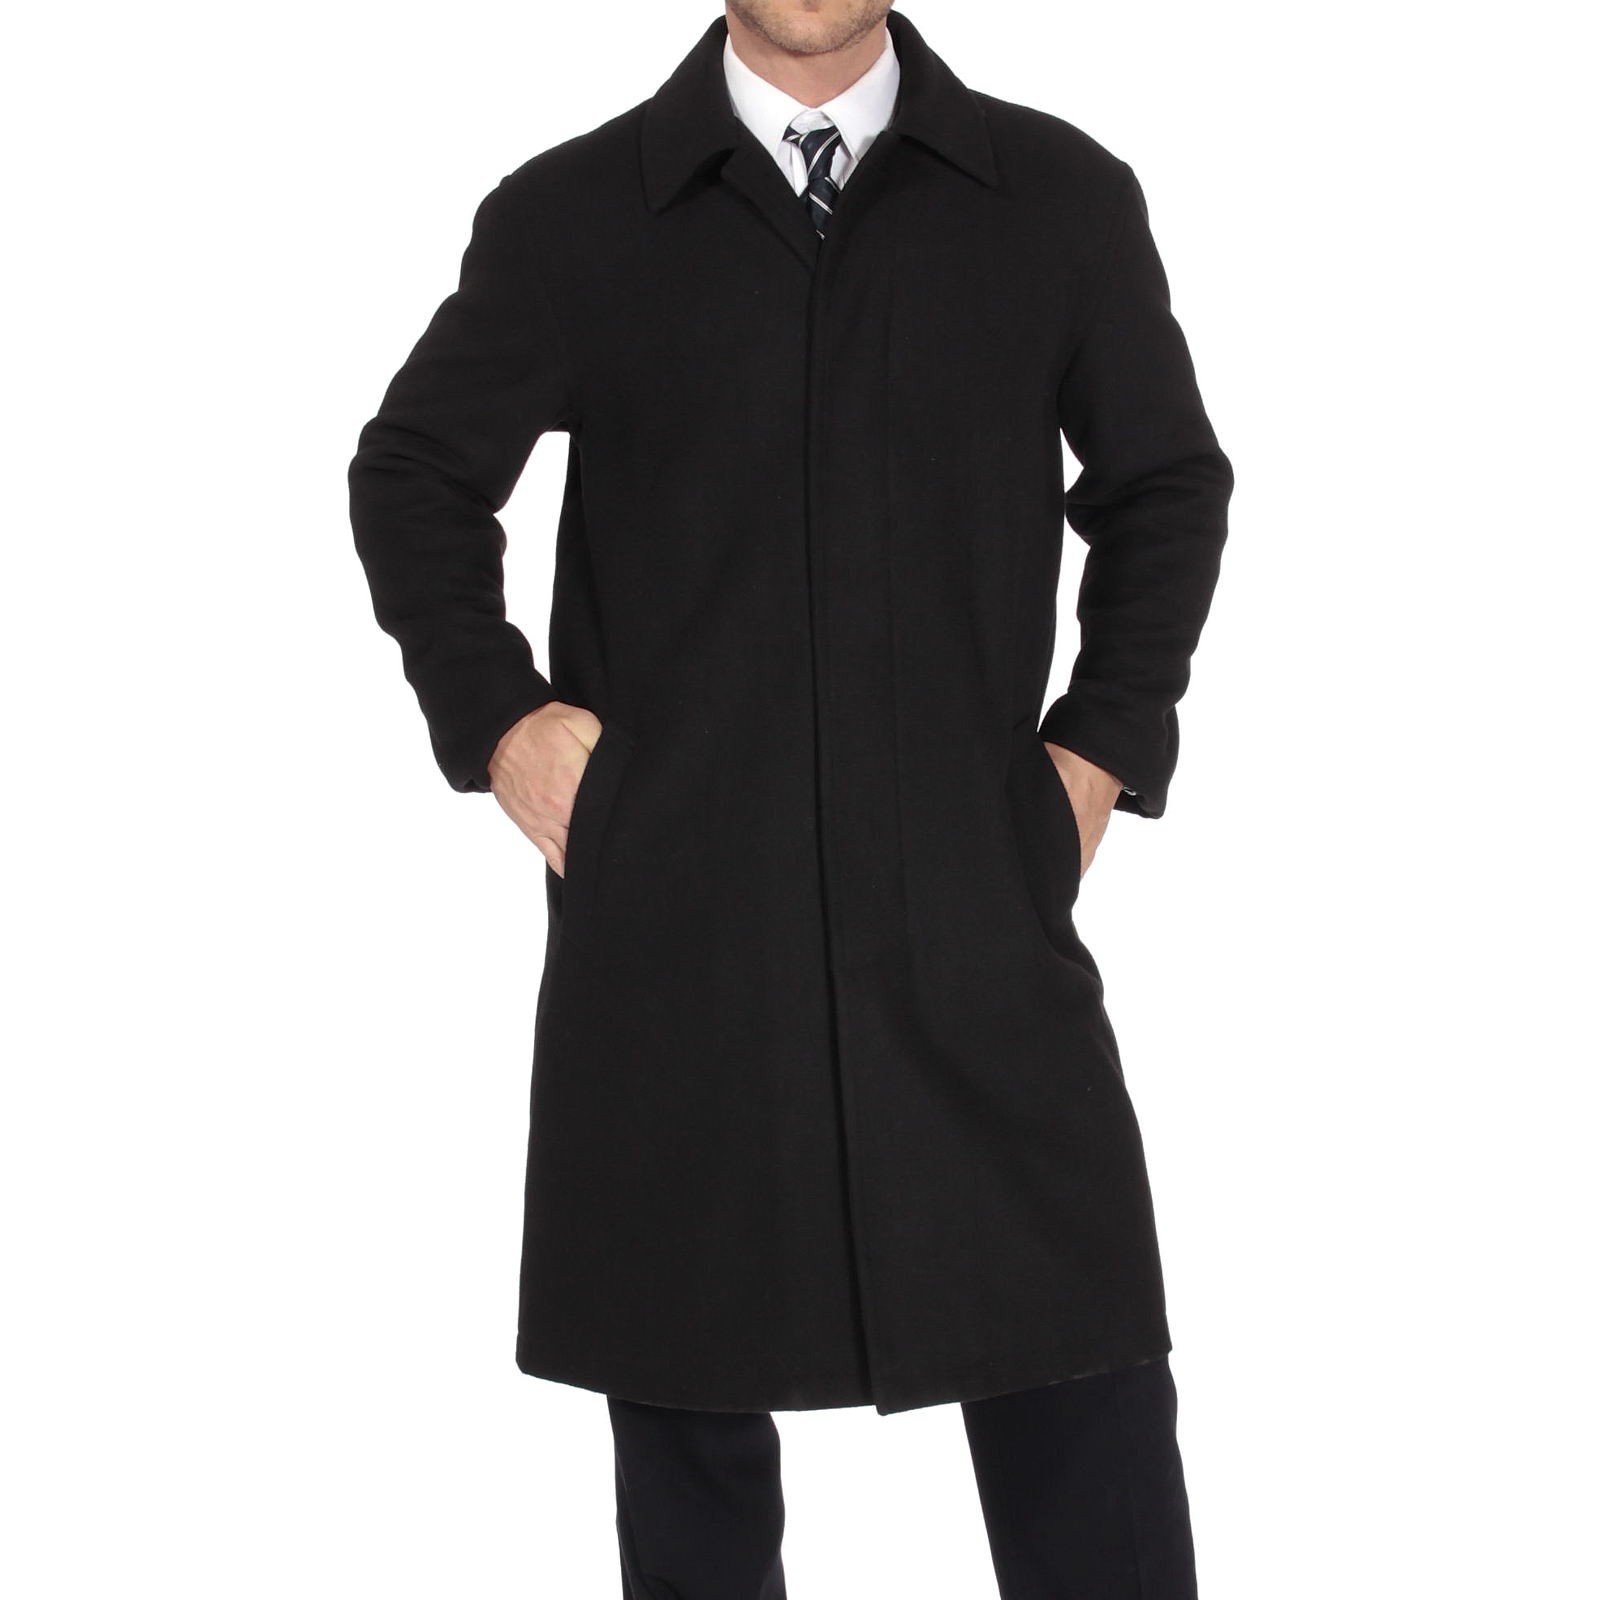 alpine swiss Zach Mens Wool Trench Coat Knee Length Overcoat Black Lrg